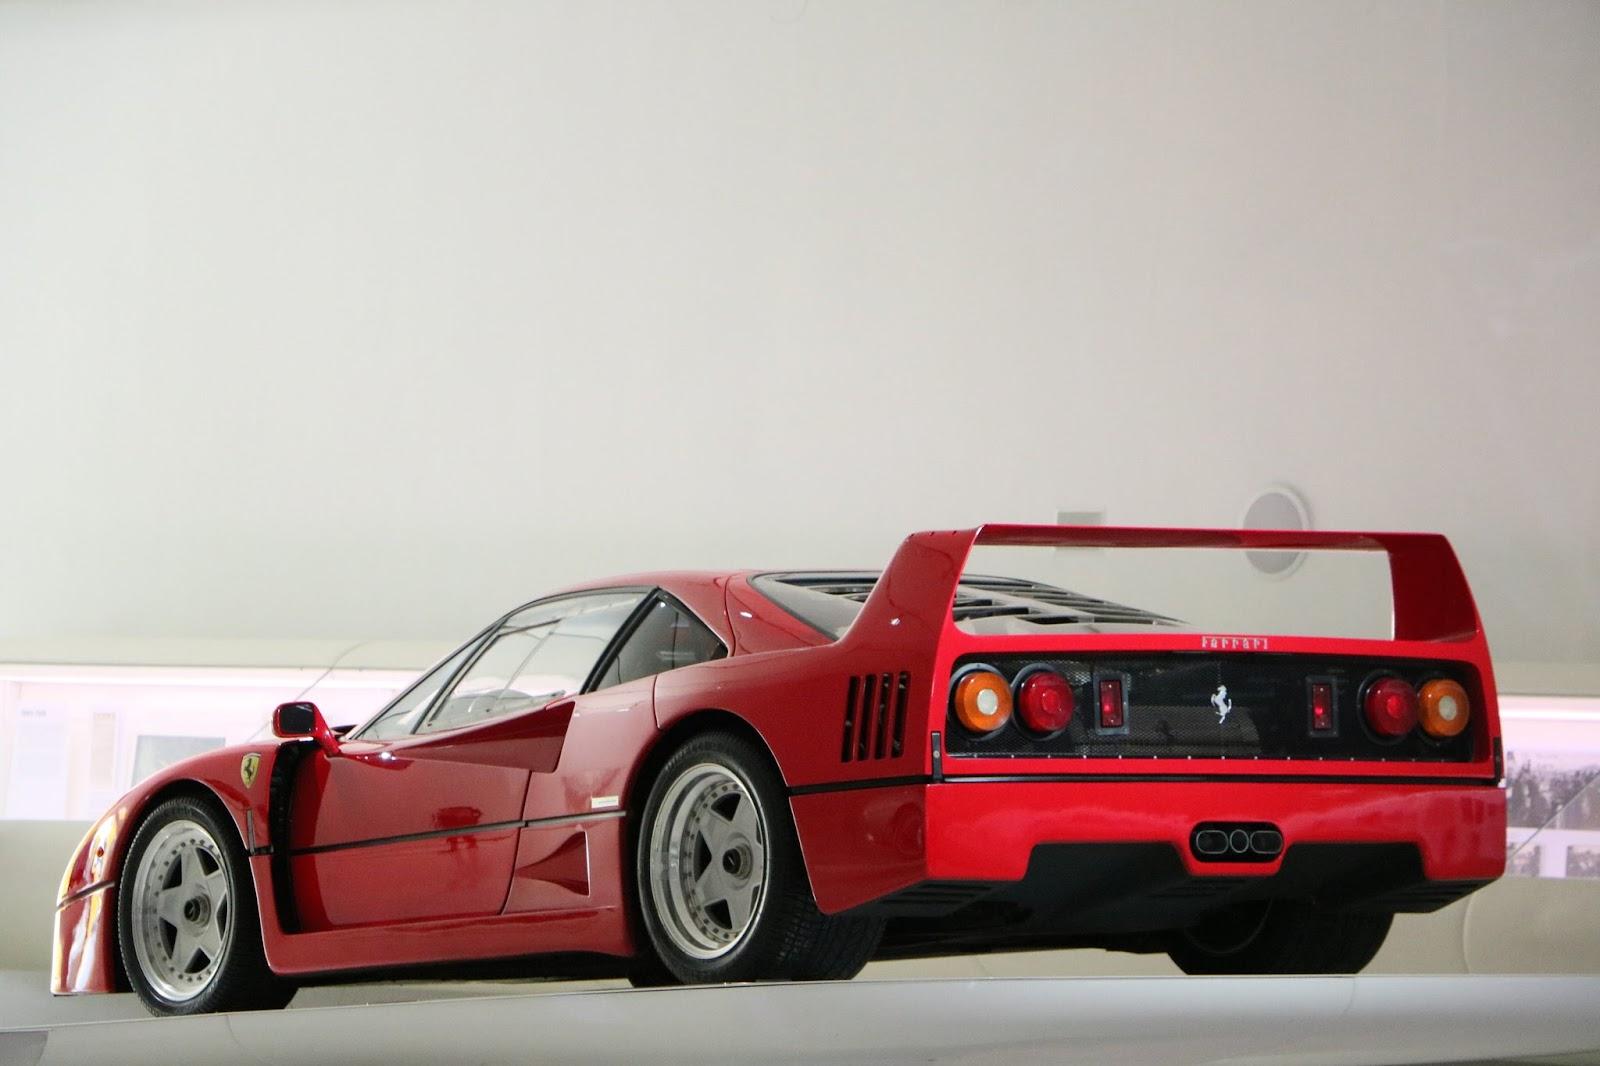 Modena - Enzo Museum 0068 - Ferrari F40.jpg